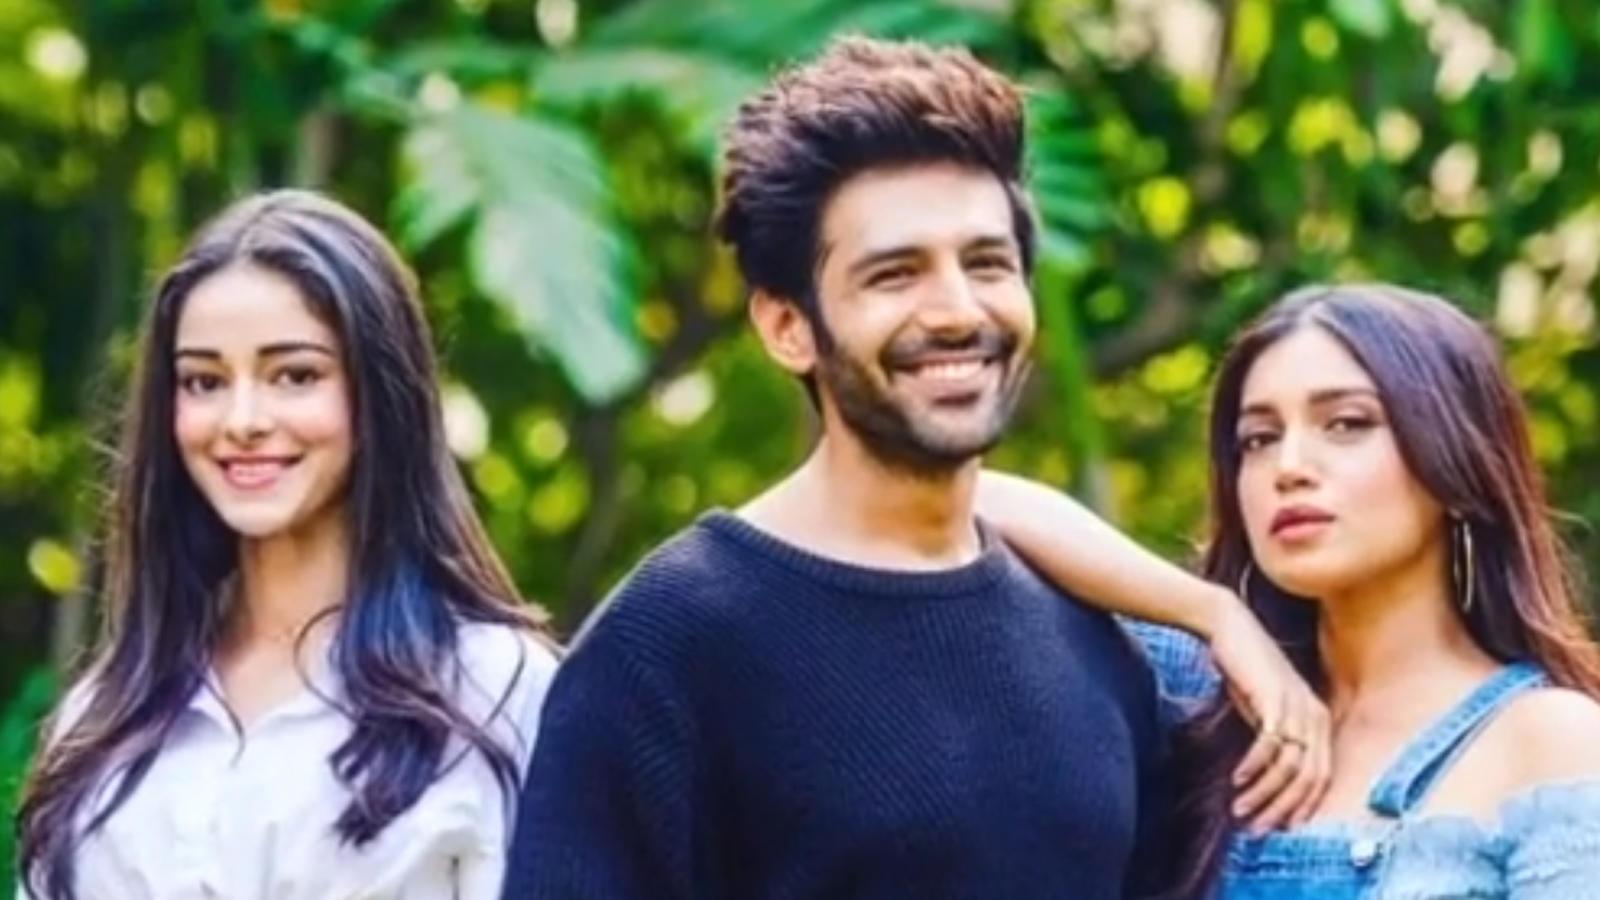 Kartik Aaryan is really funny, says Ananya Panday